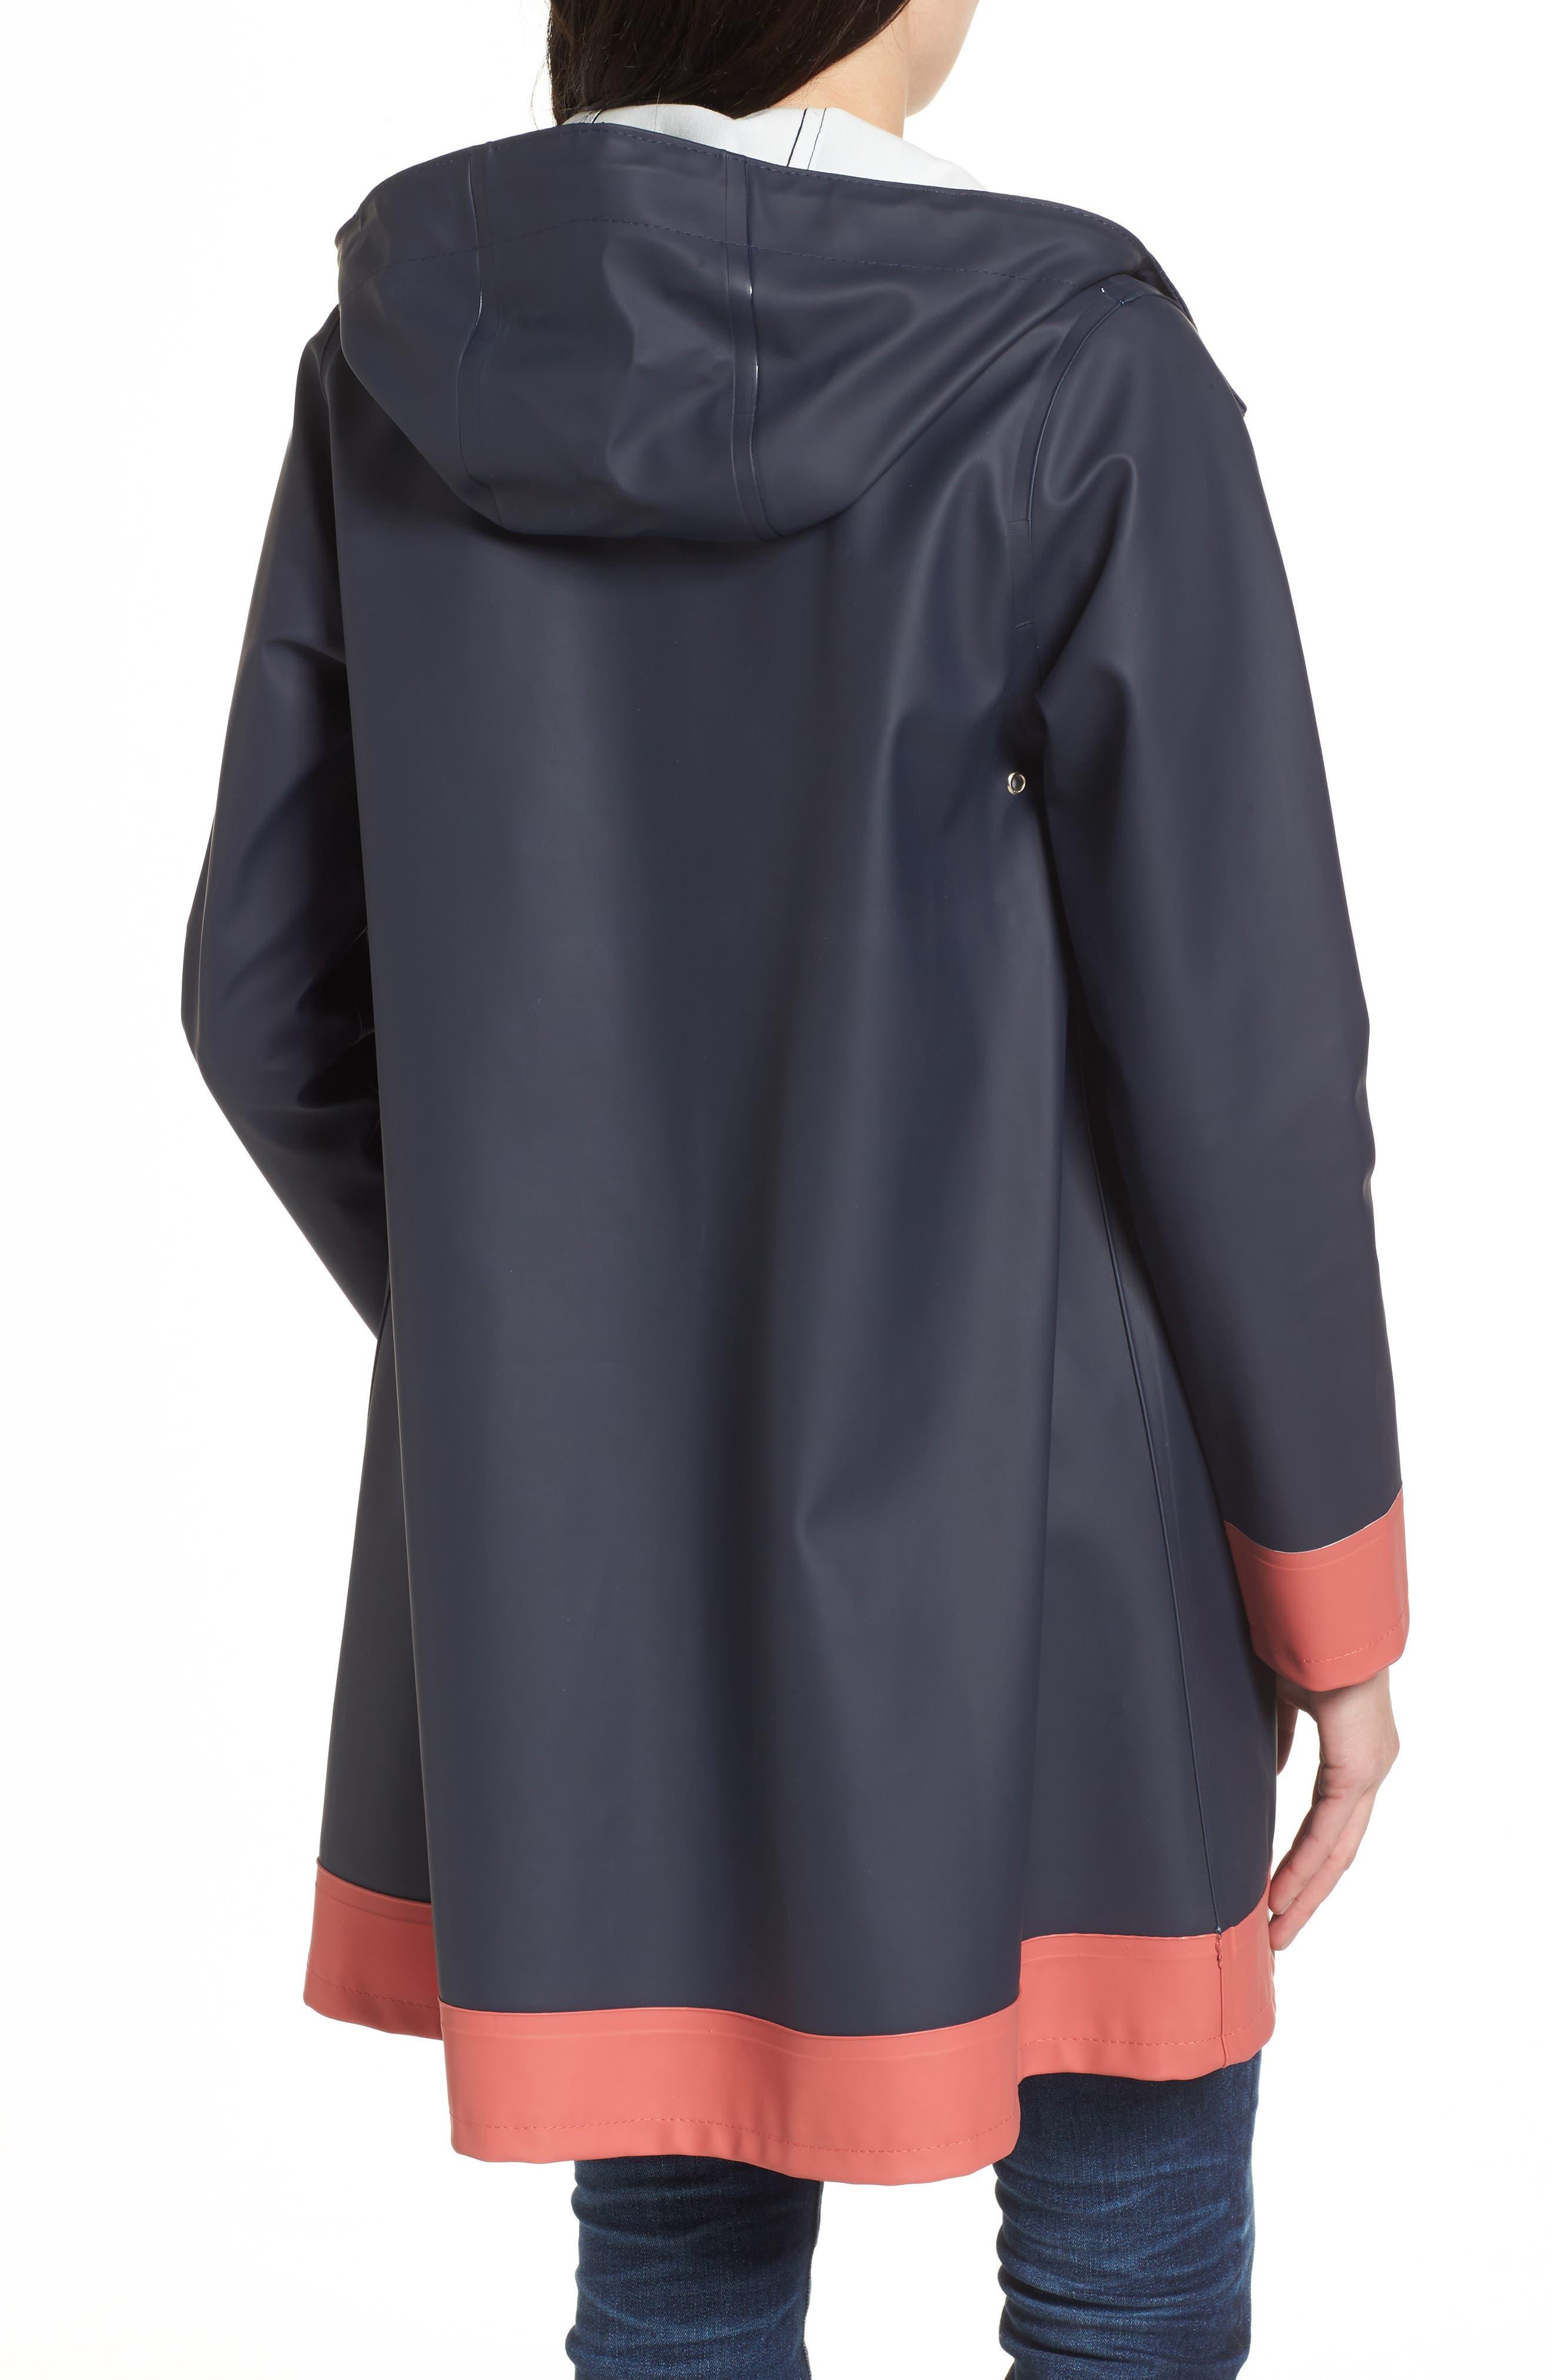 Mosebacke Frame Colorblock Raincoat,                             Alternate thumbnail 2, color,                             Navy/ Faded Rose